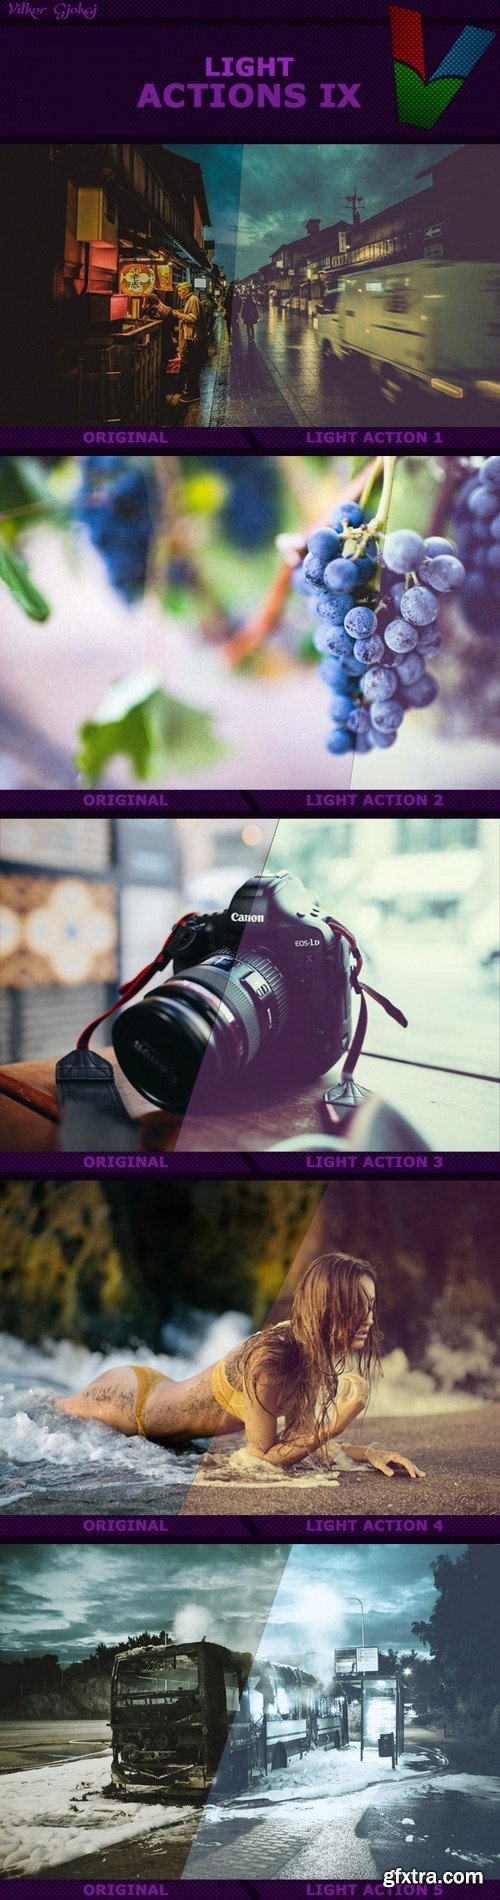 Graphicriver - Light Actions IX 18007843